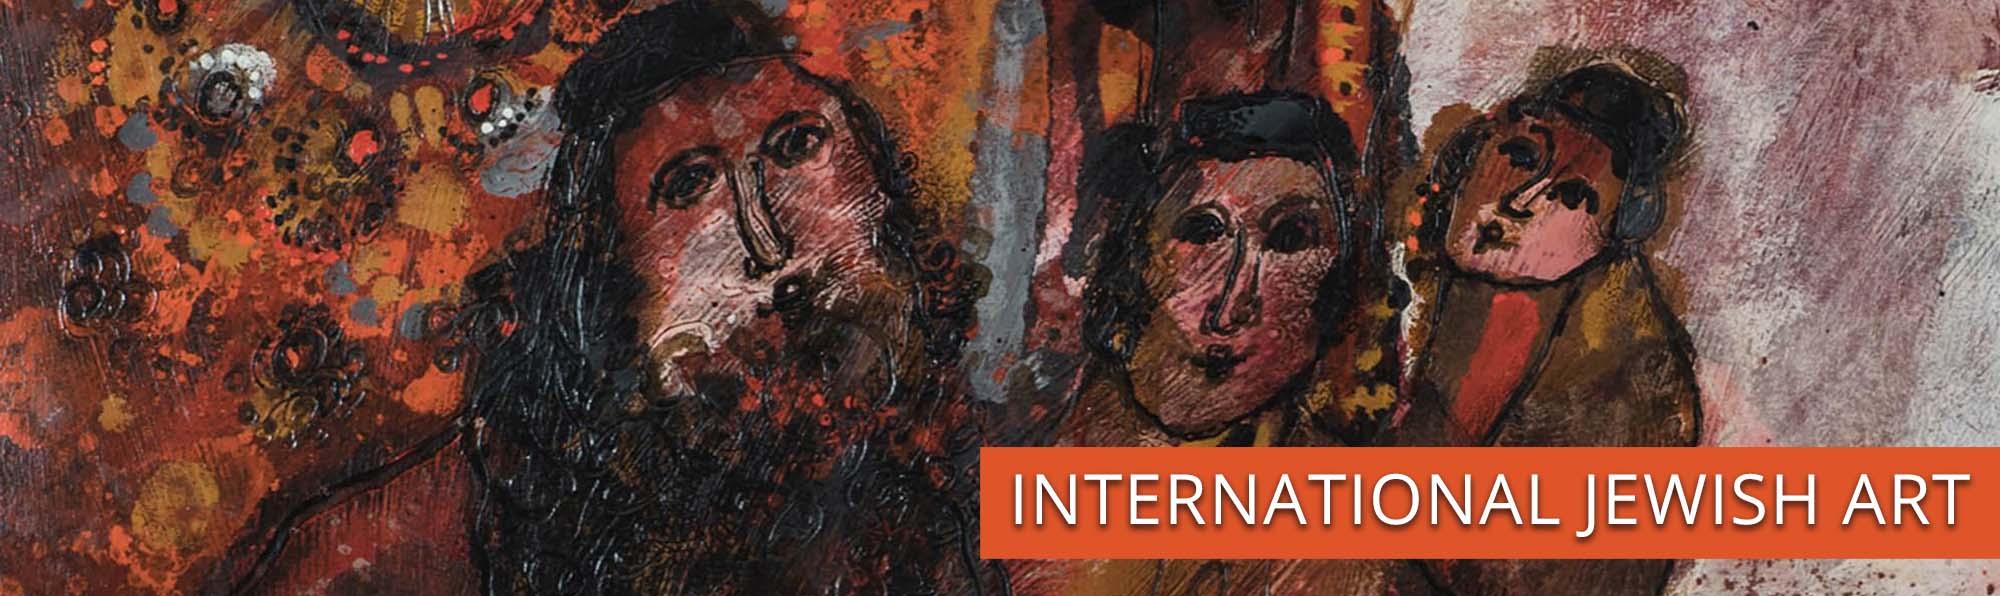 International Jewish Art